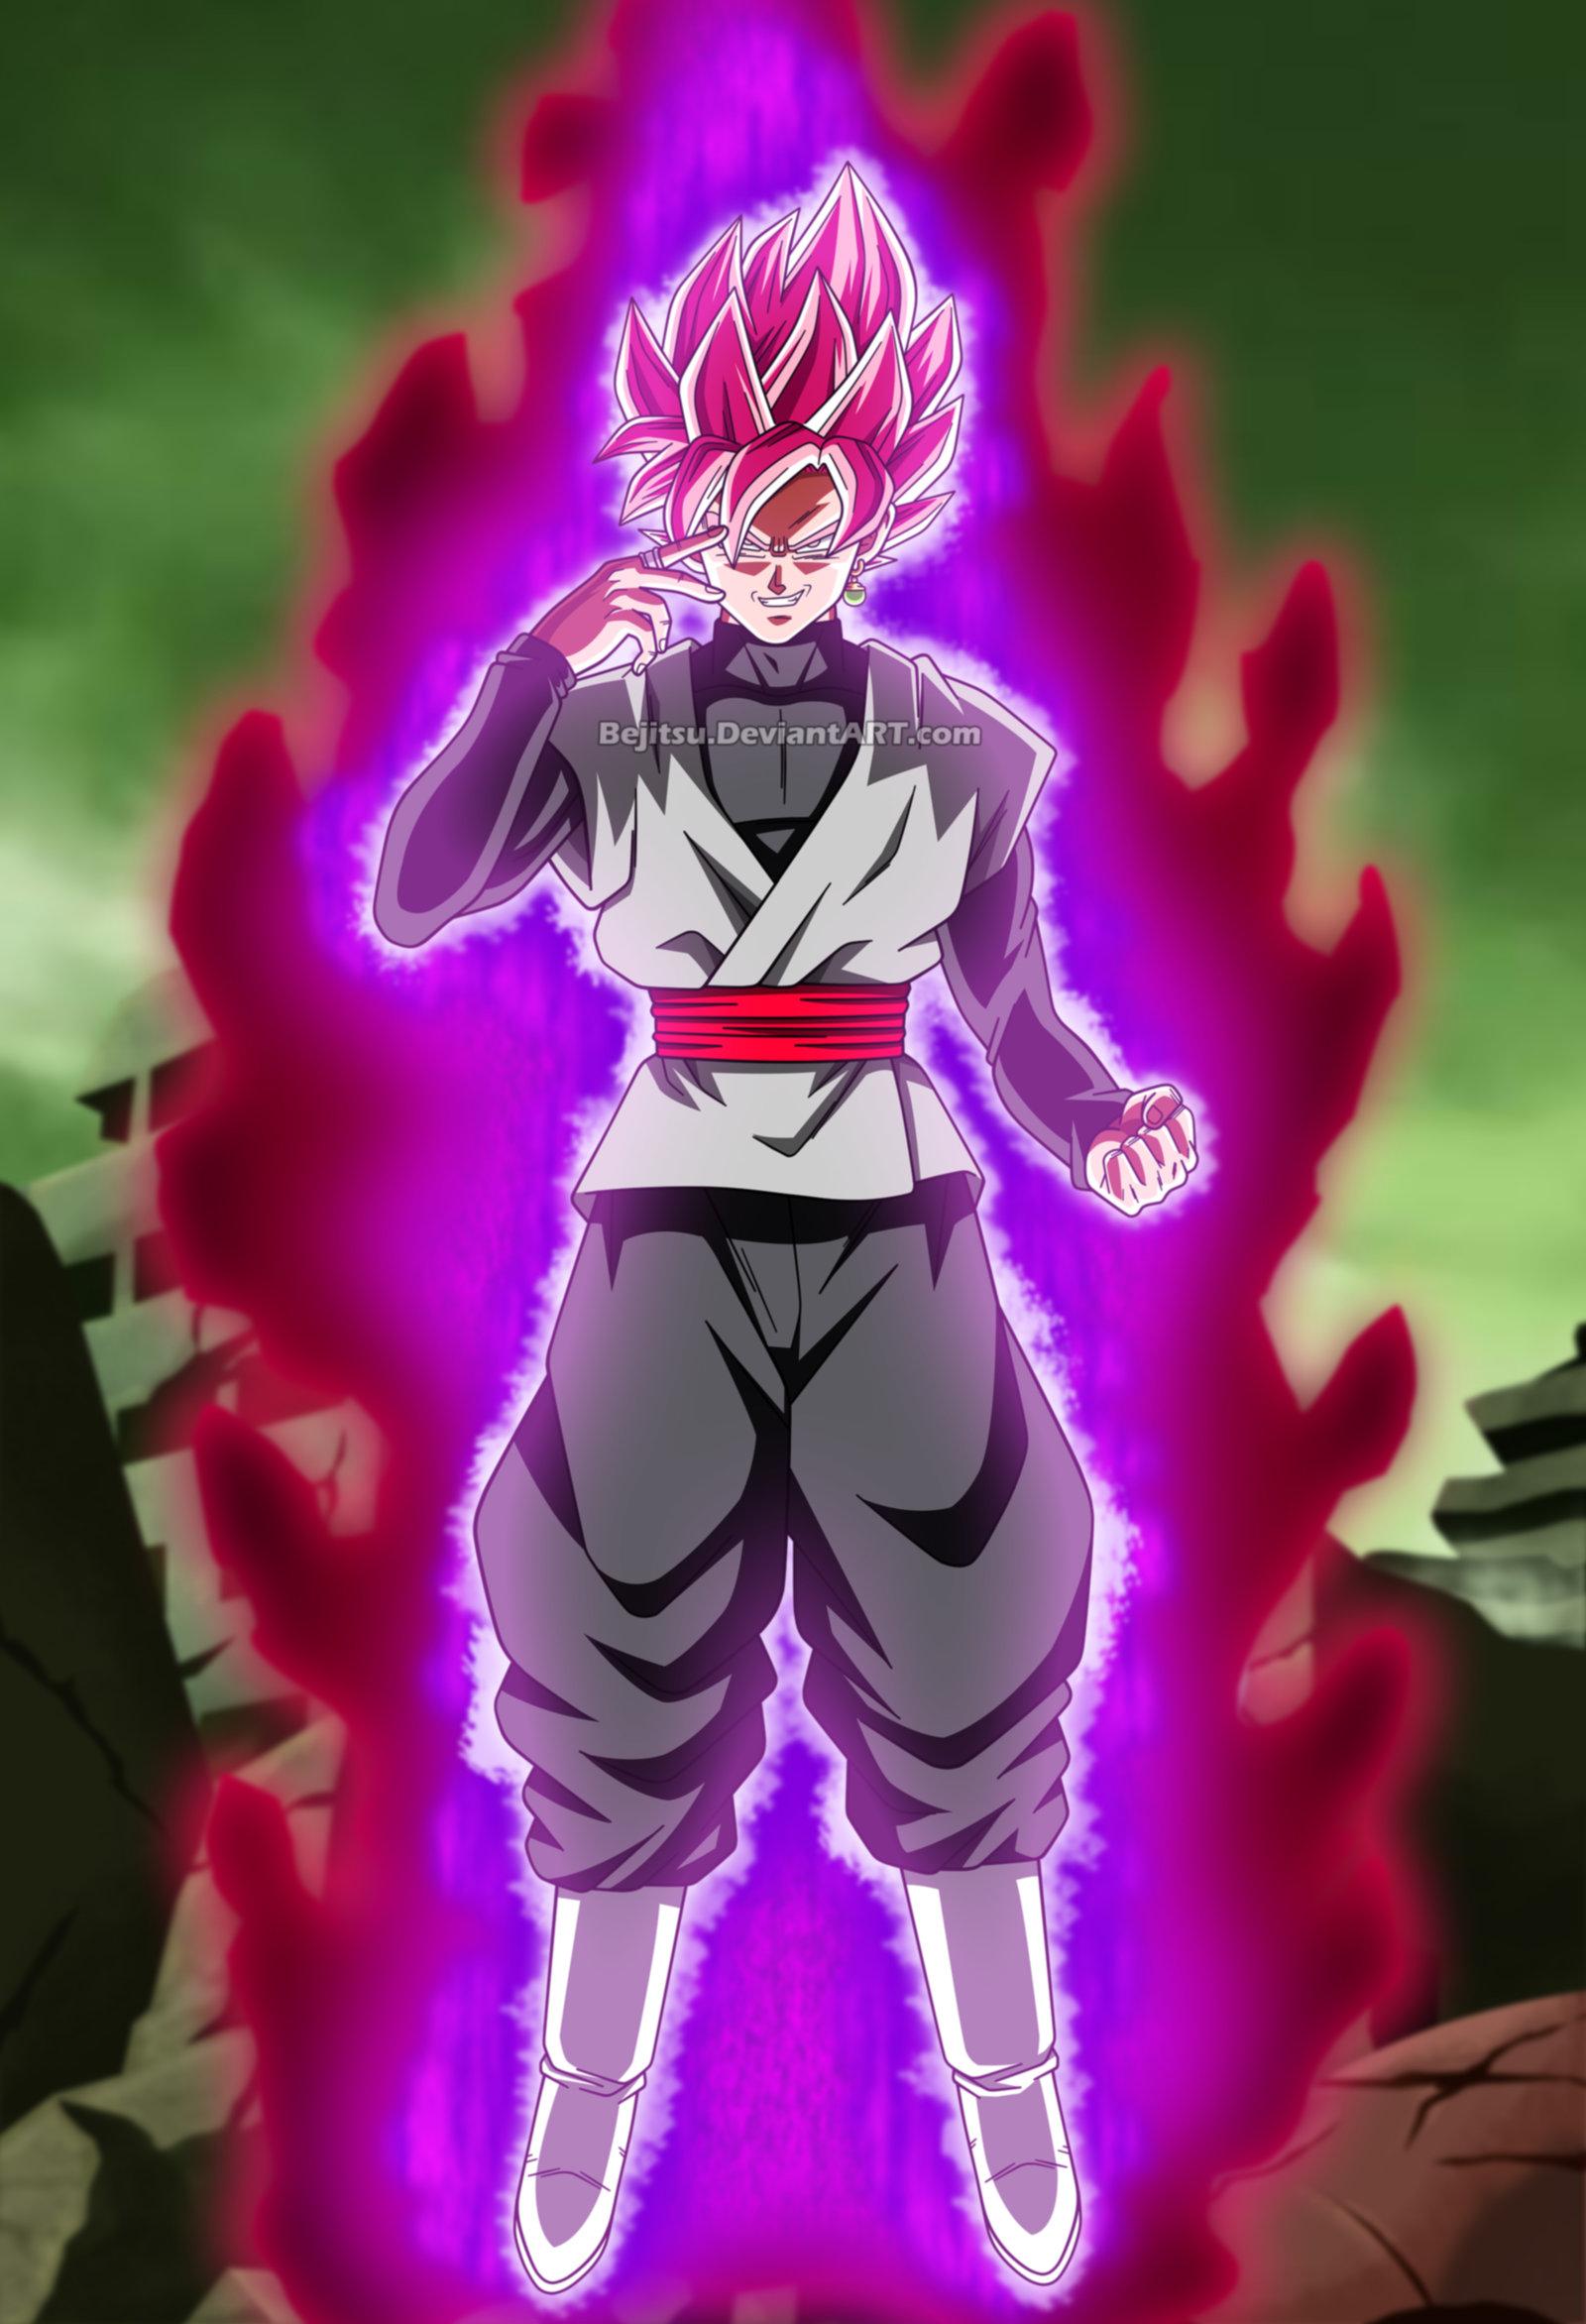 Dragon Ball Super Black Goku By Bejitsu Dragon Ball Super Goku Black Ssj Rose 1600x2344 Download Hd Wallpaper Wallpapertip